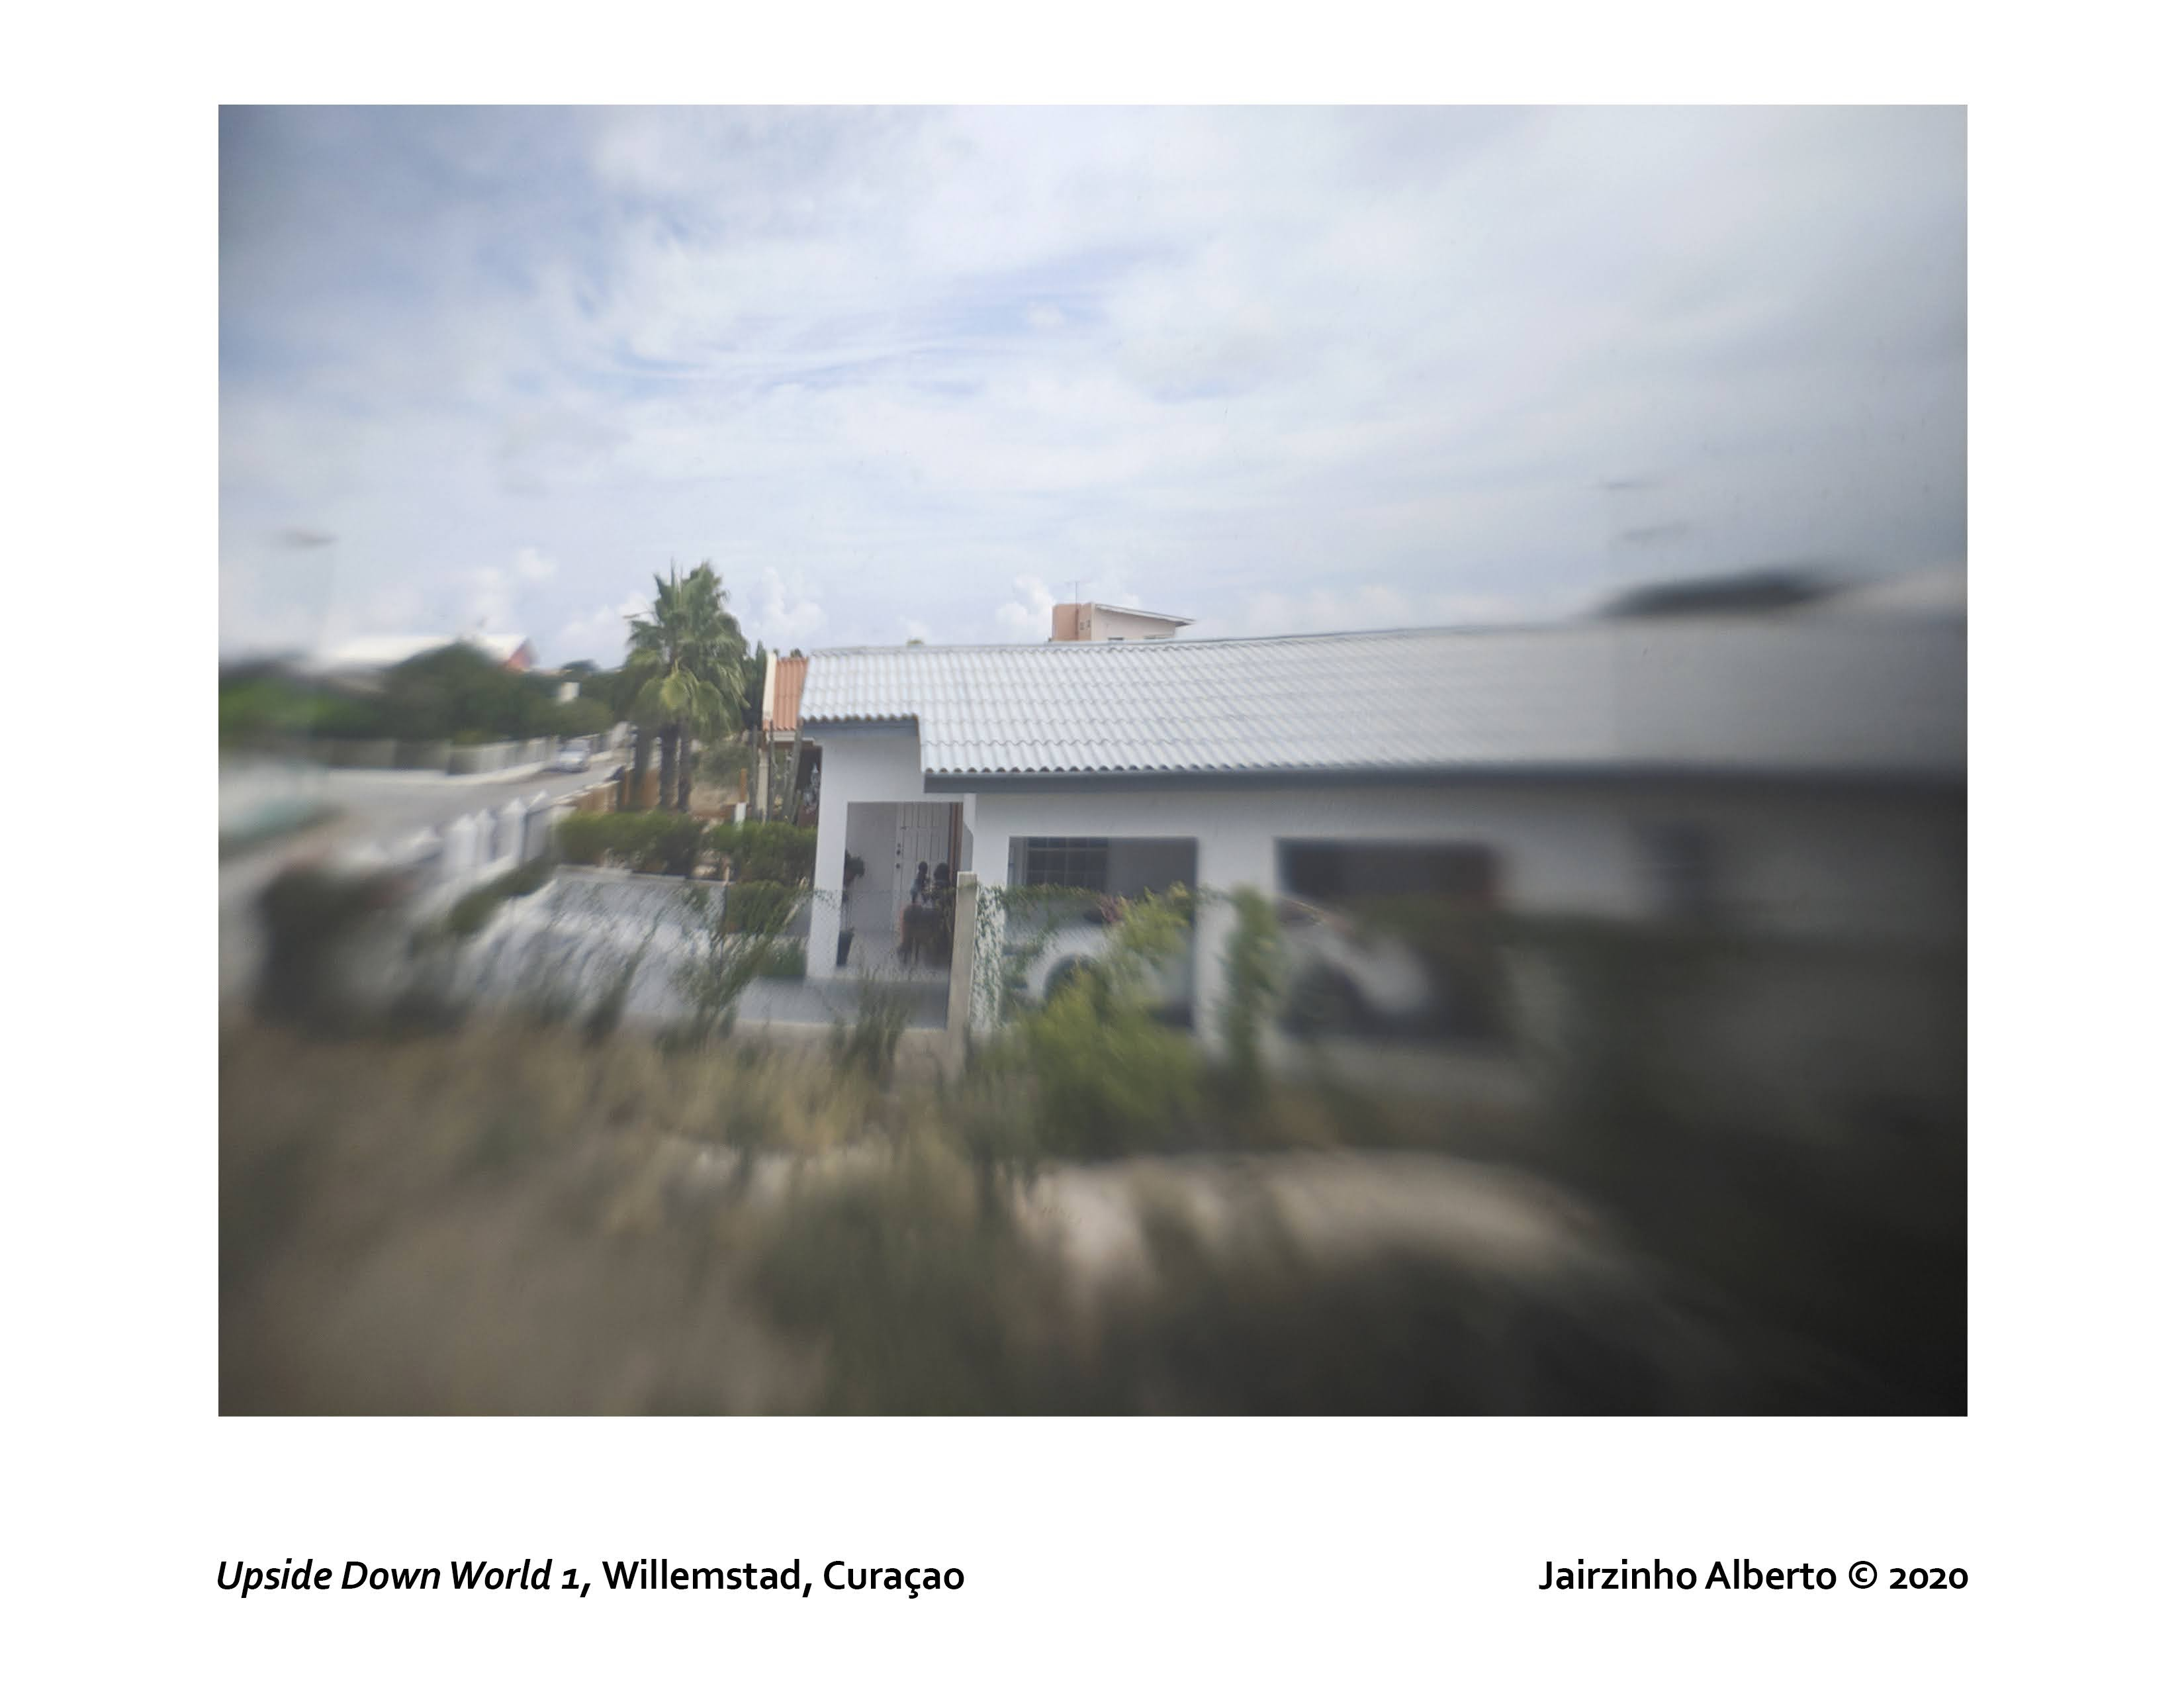 Jairzinho Alberto camera obscura print of his neighborhood